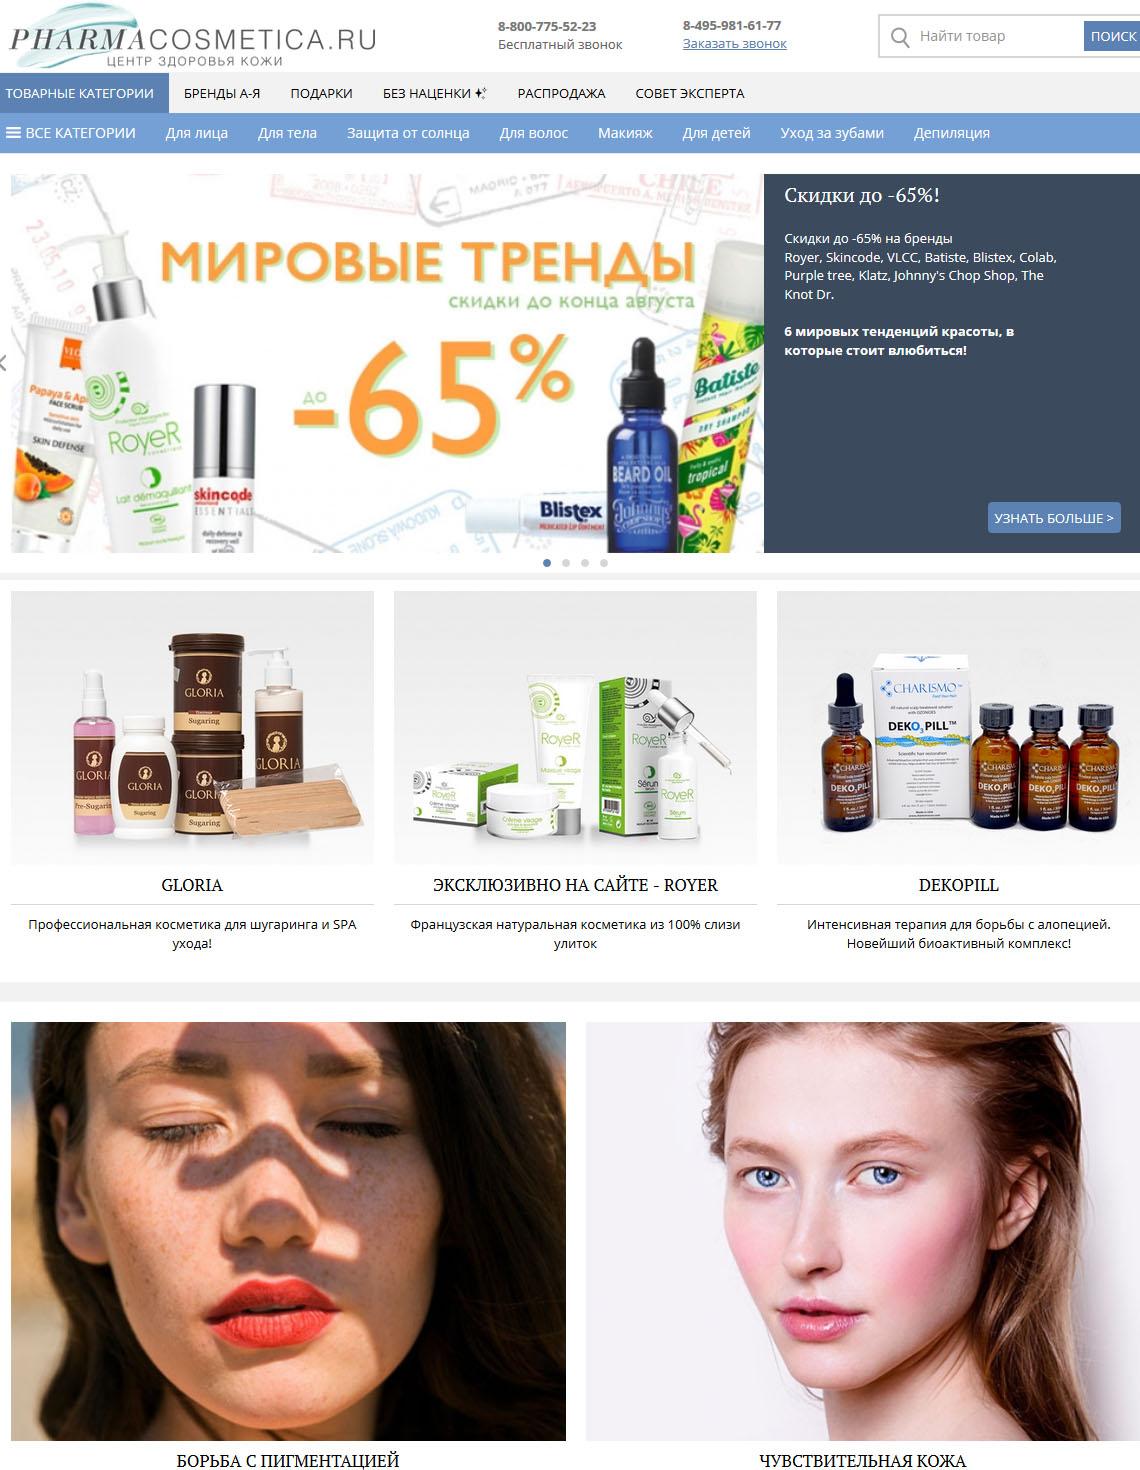 Интернет-магазин Фармакосметика